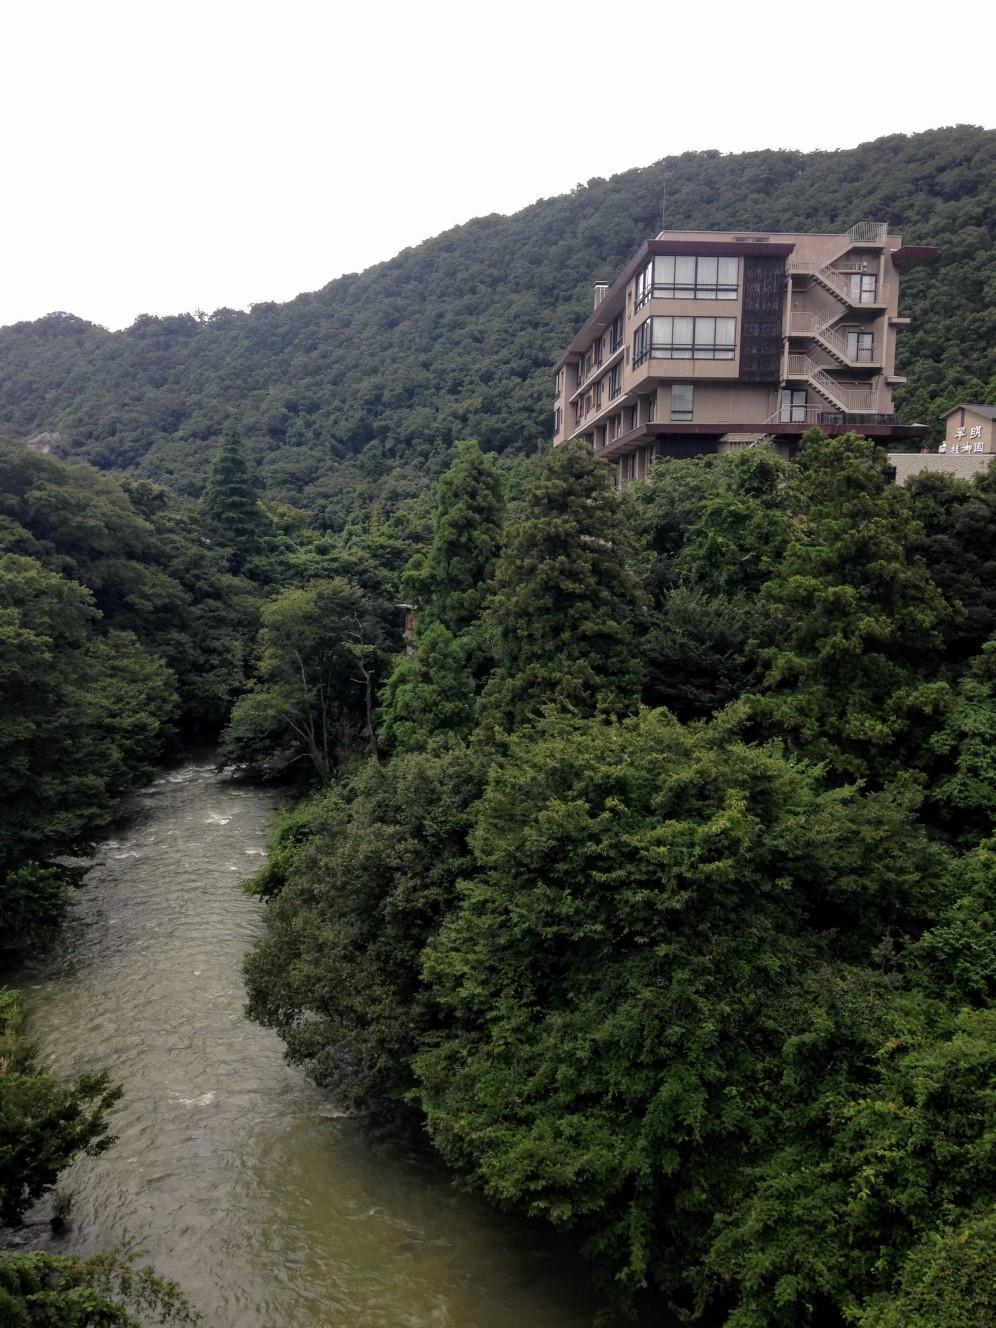 The ryokan, high above the quaint river.